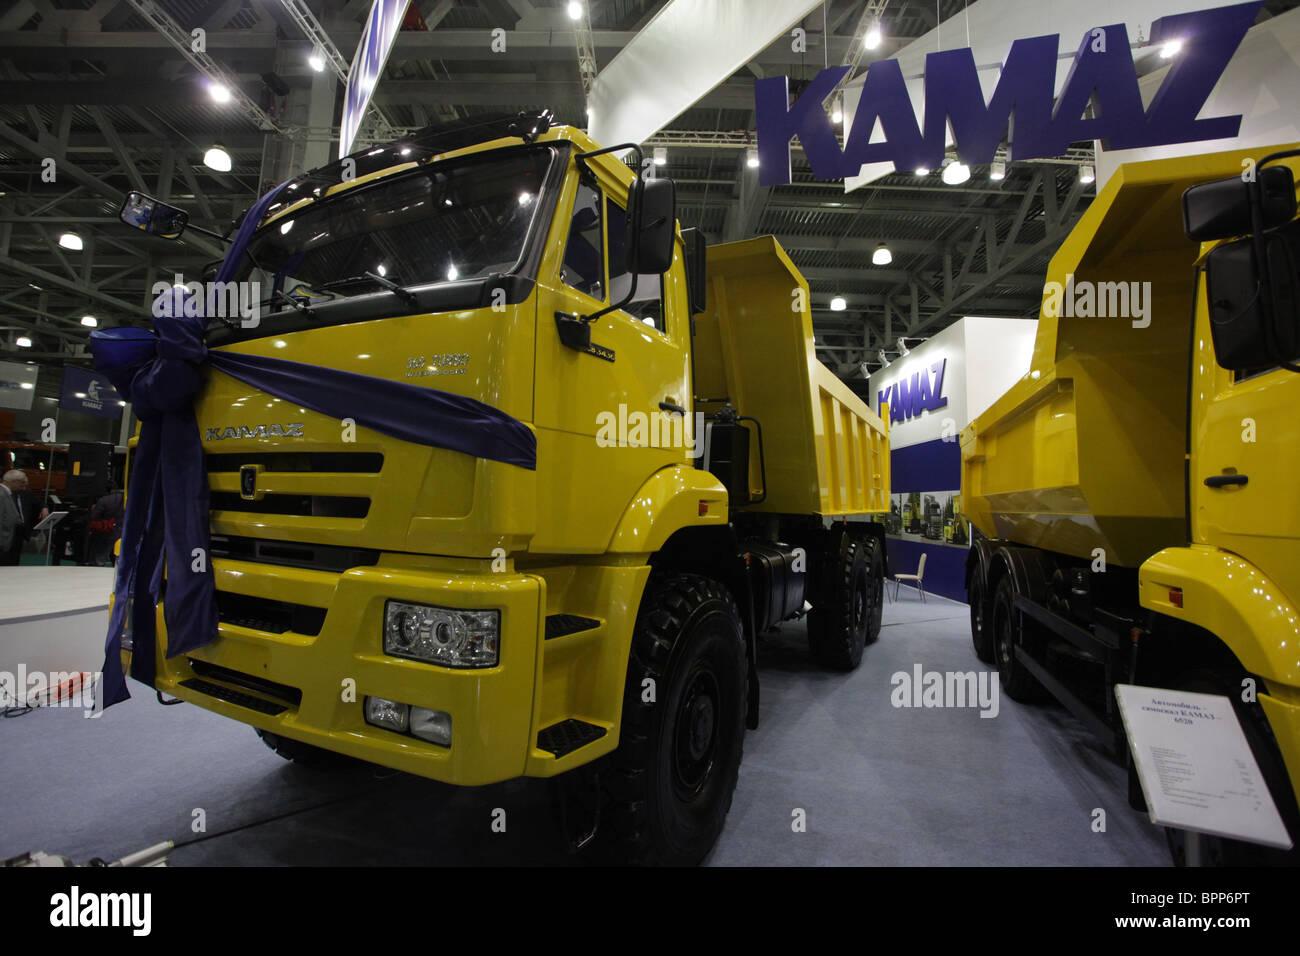 Moscow hosts InterAuto 2009 International Automotive Exhibition - Stock Image